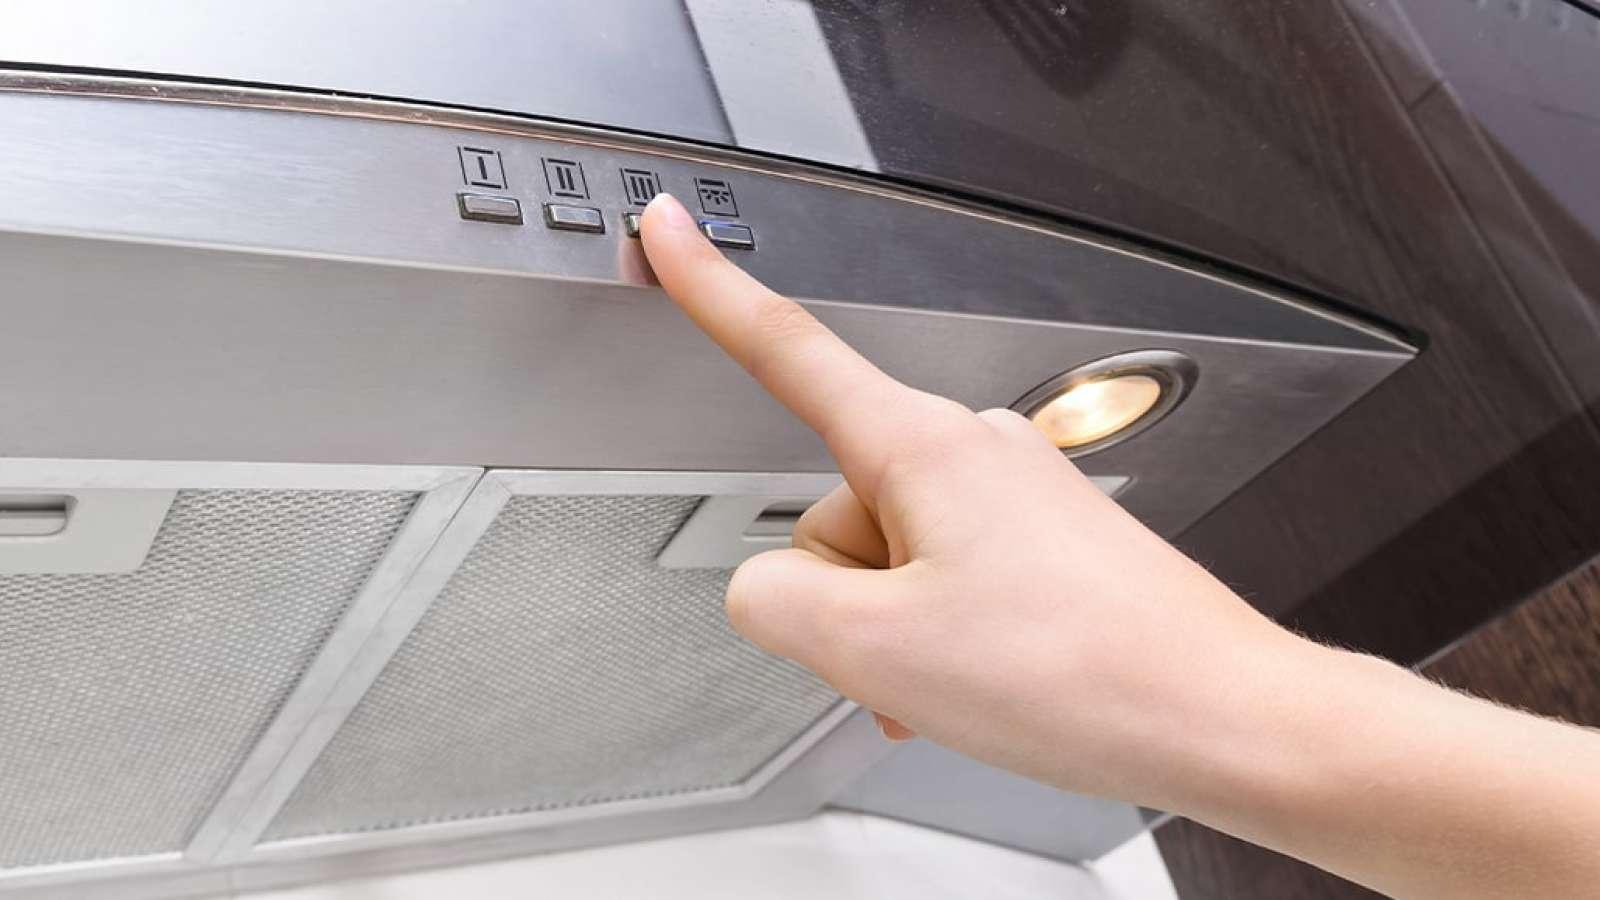 finger pressing button on an exhaust fan